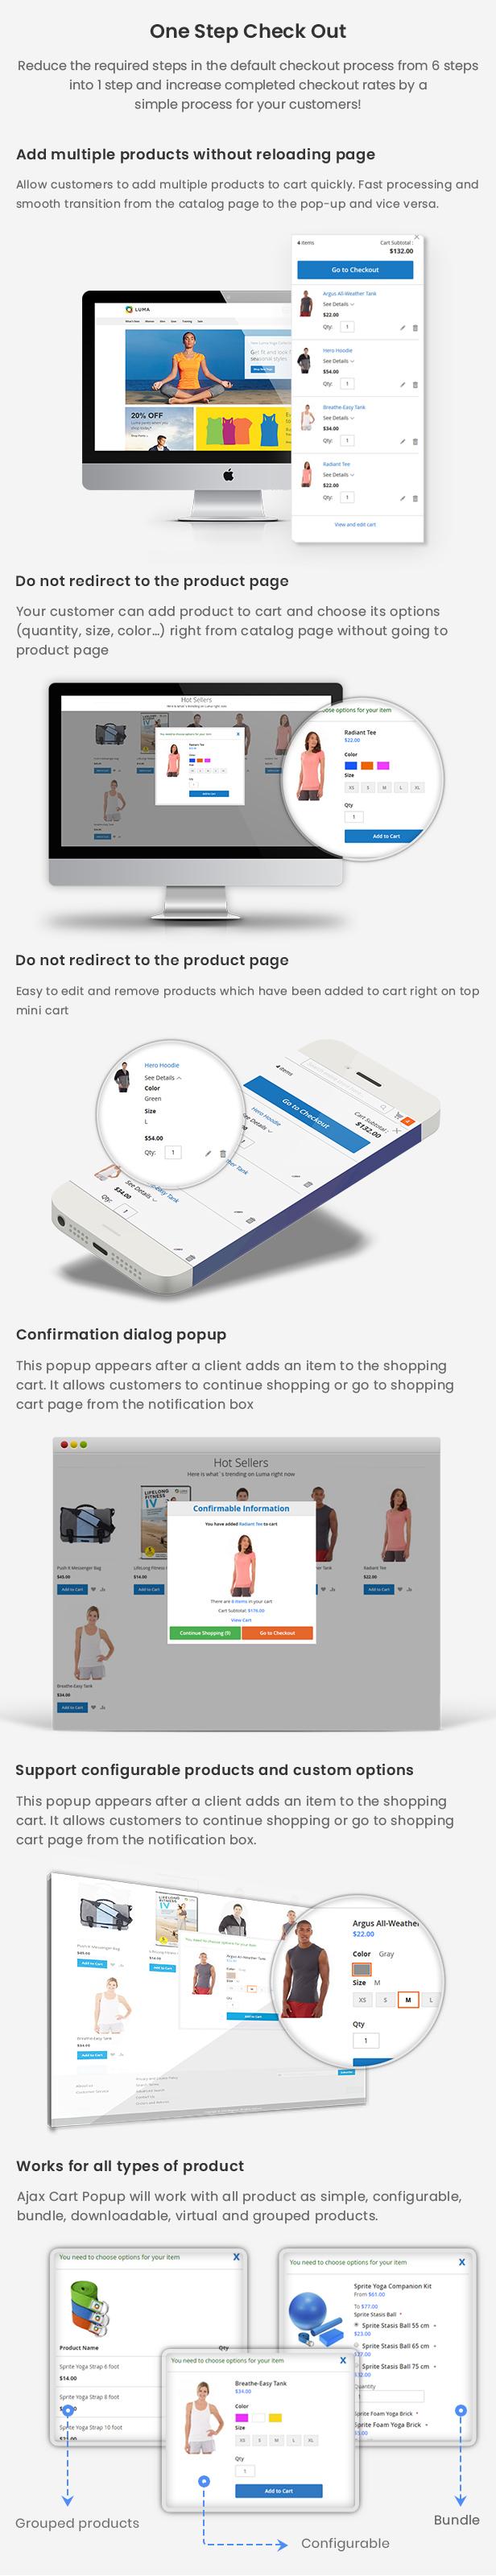 Printshop - Responsive Magento Printing Theme - 33